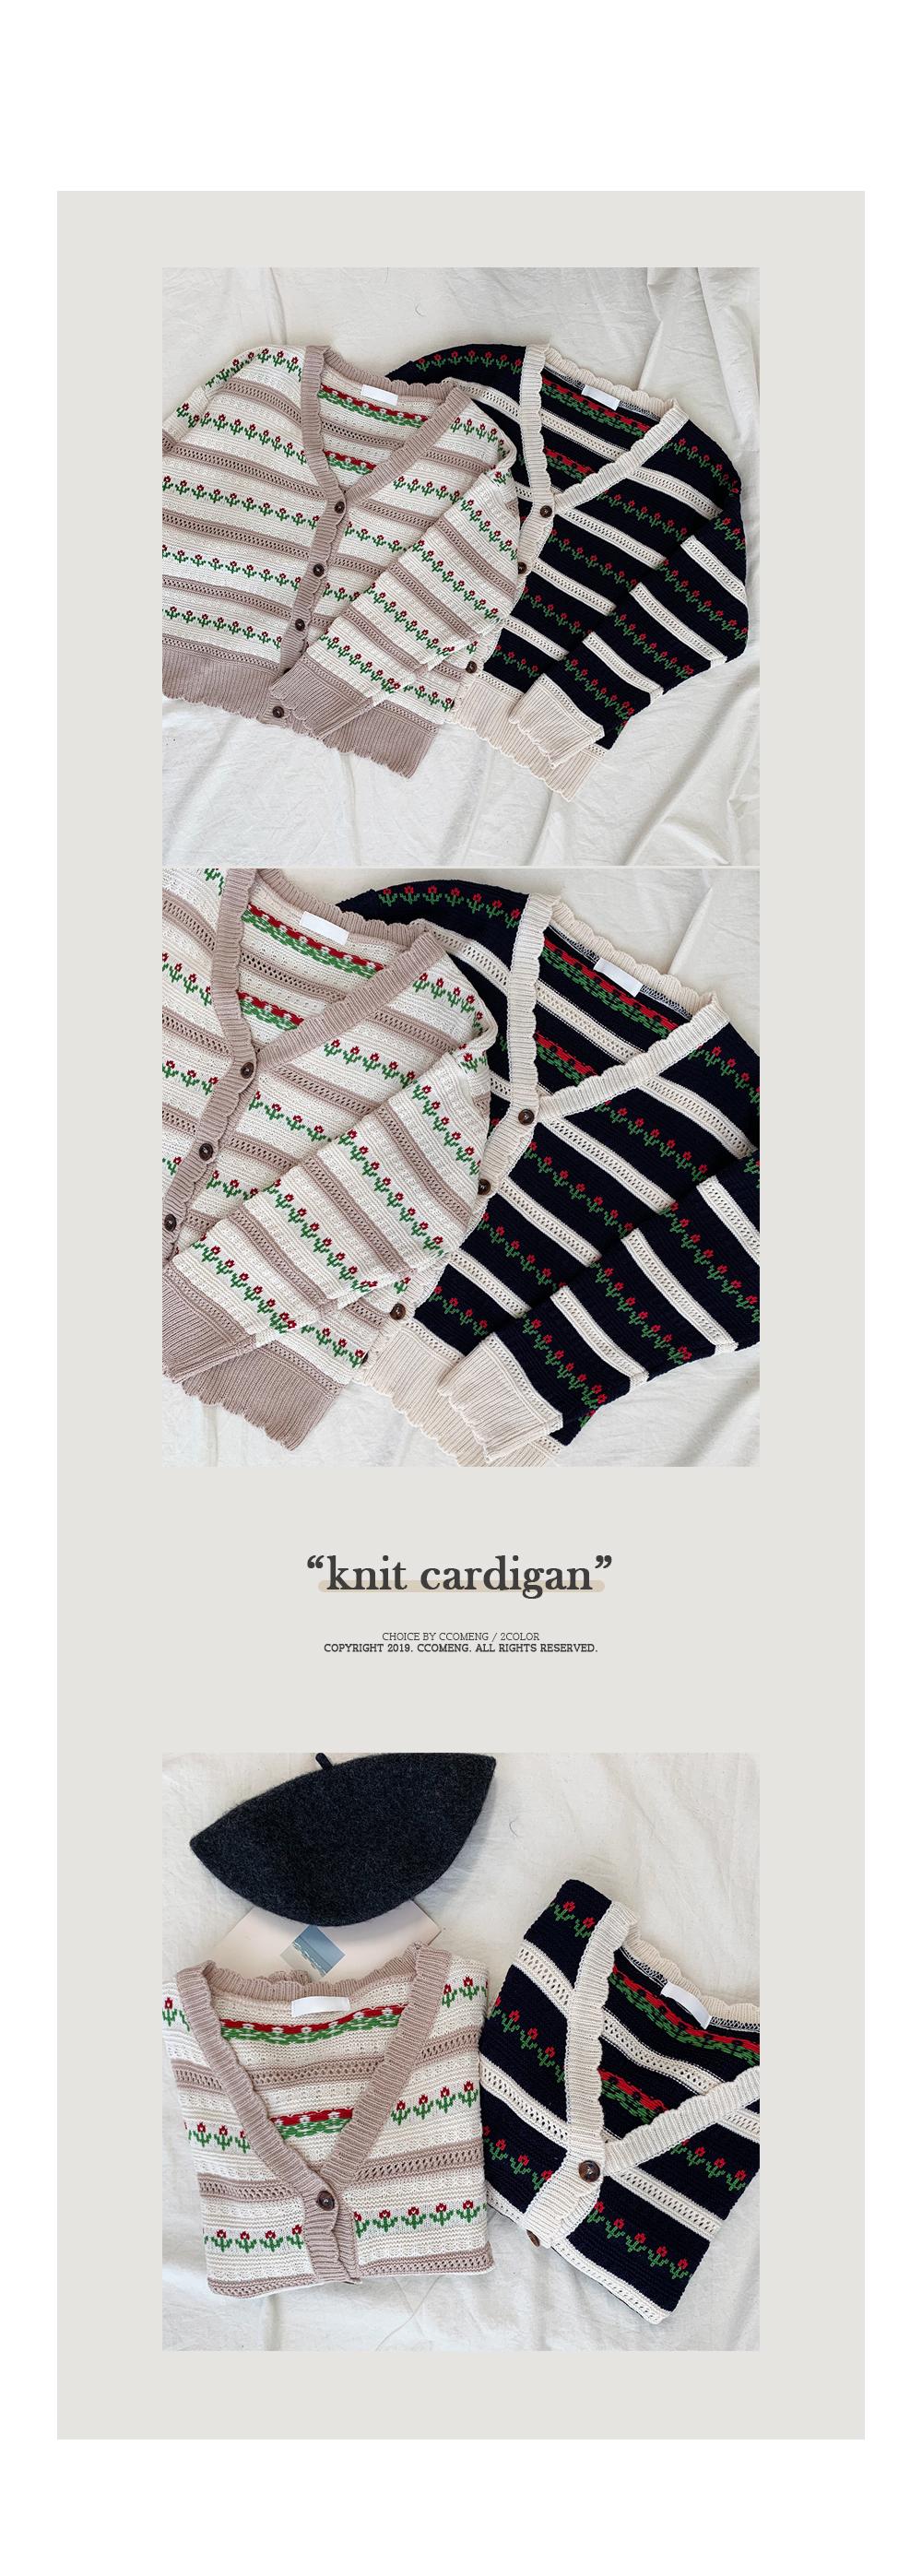 Cauliflower cardigan